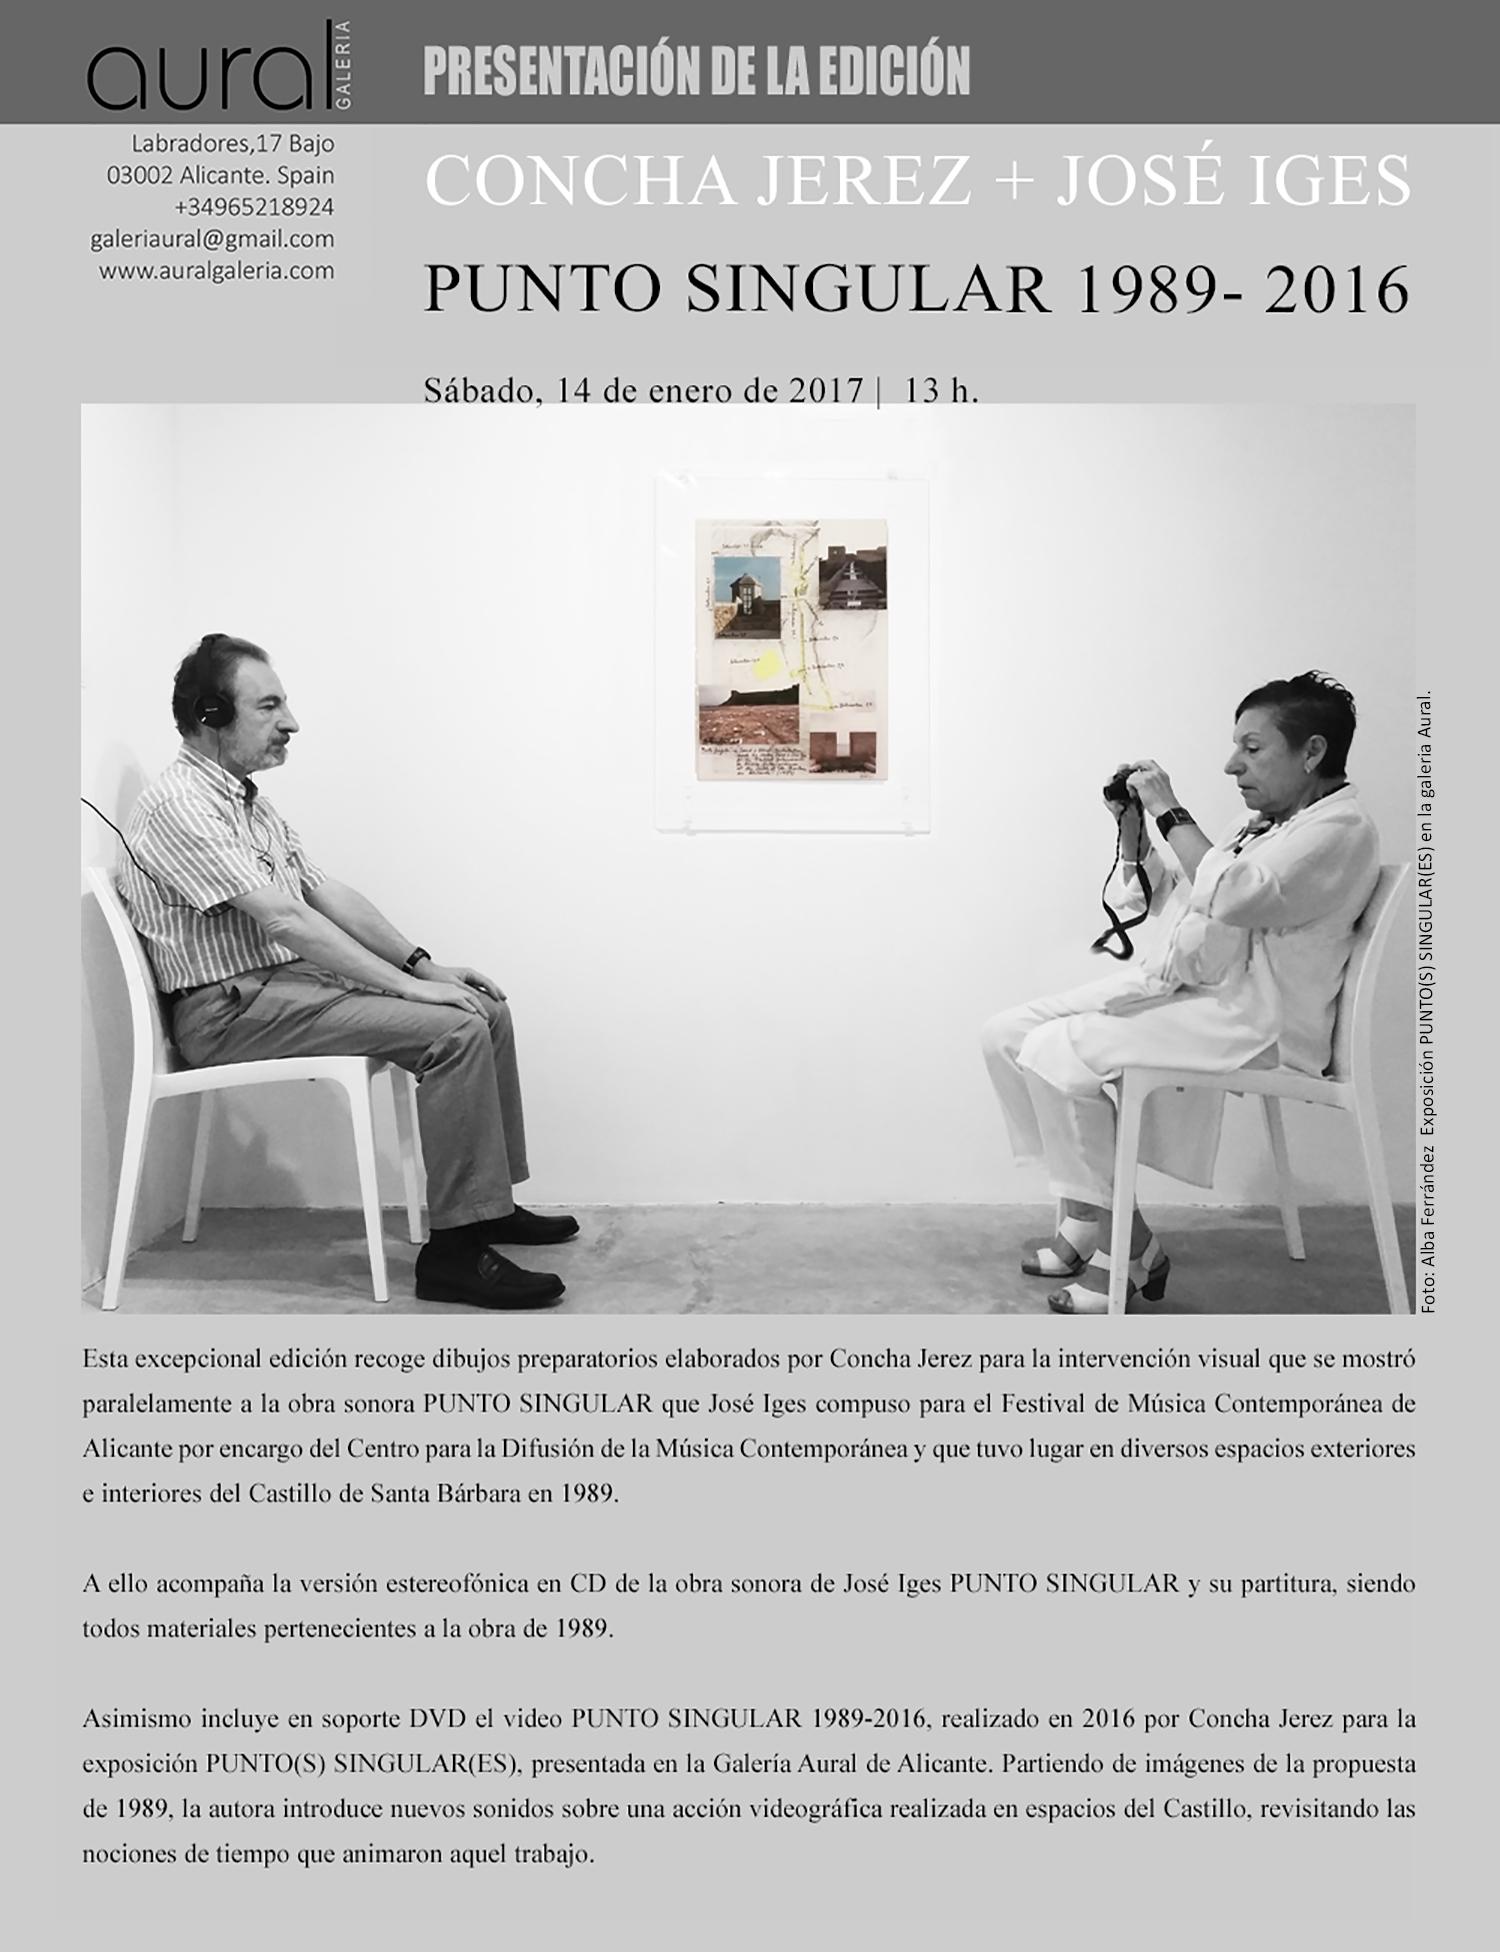 flyer-presentacion-edicion_punto-singular-1989-2017_concha-jerez-jose-iges_14-01-2017